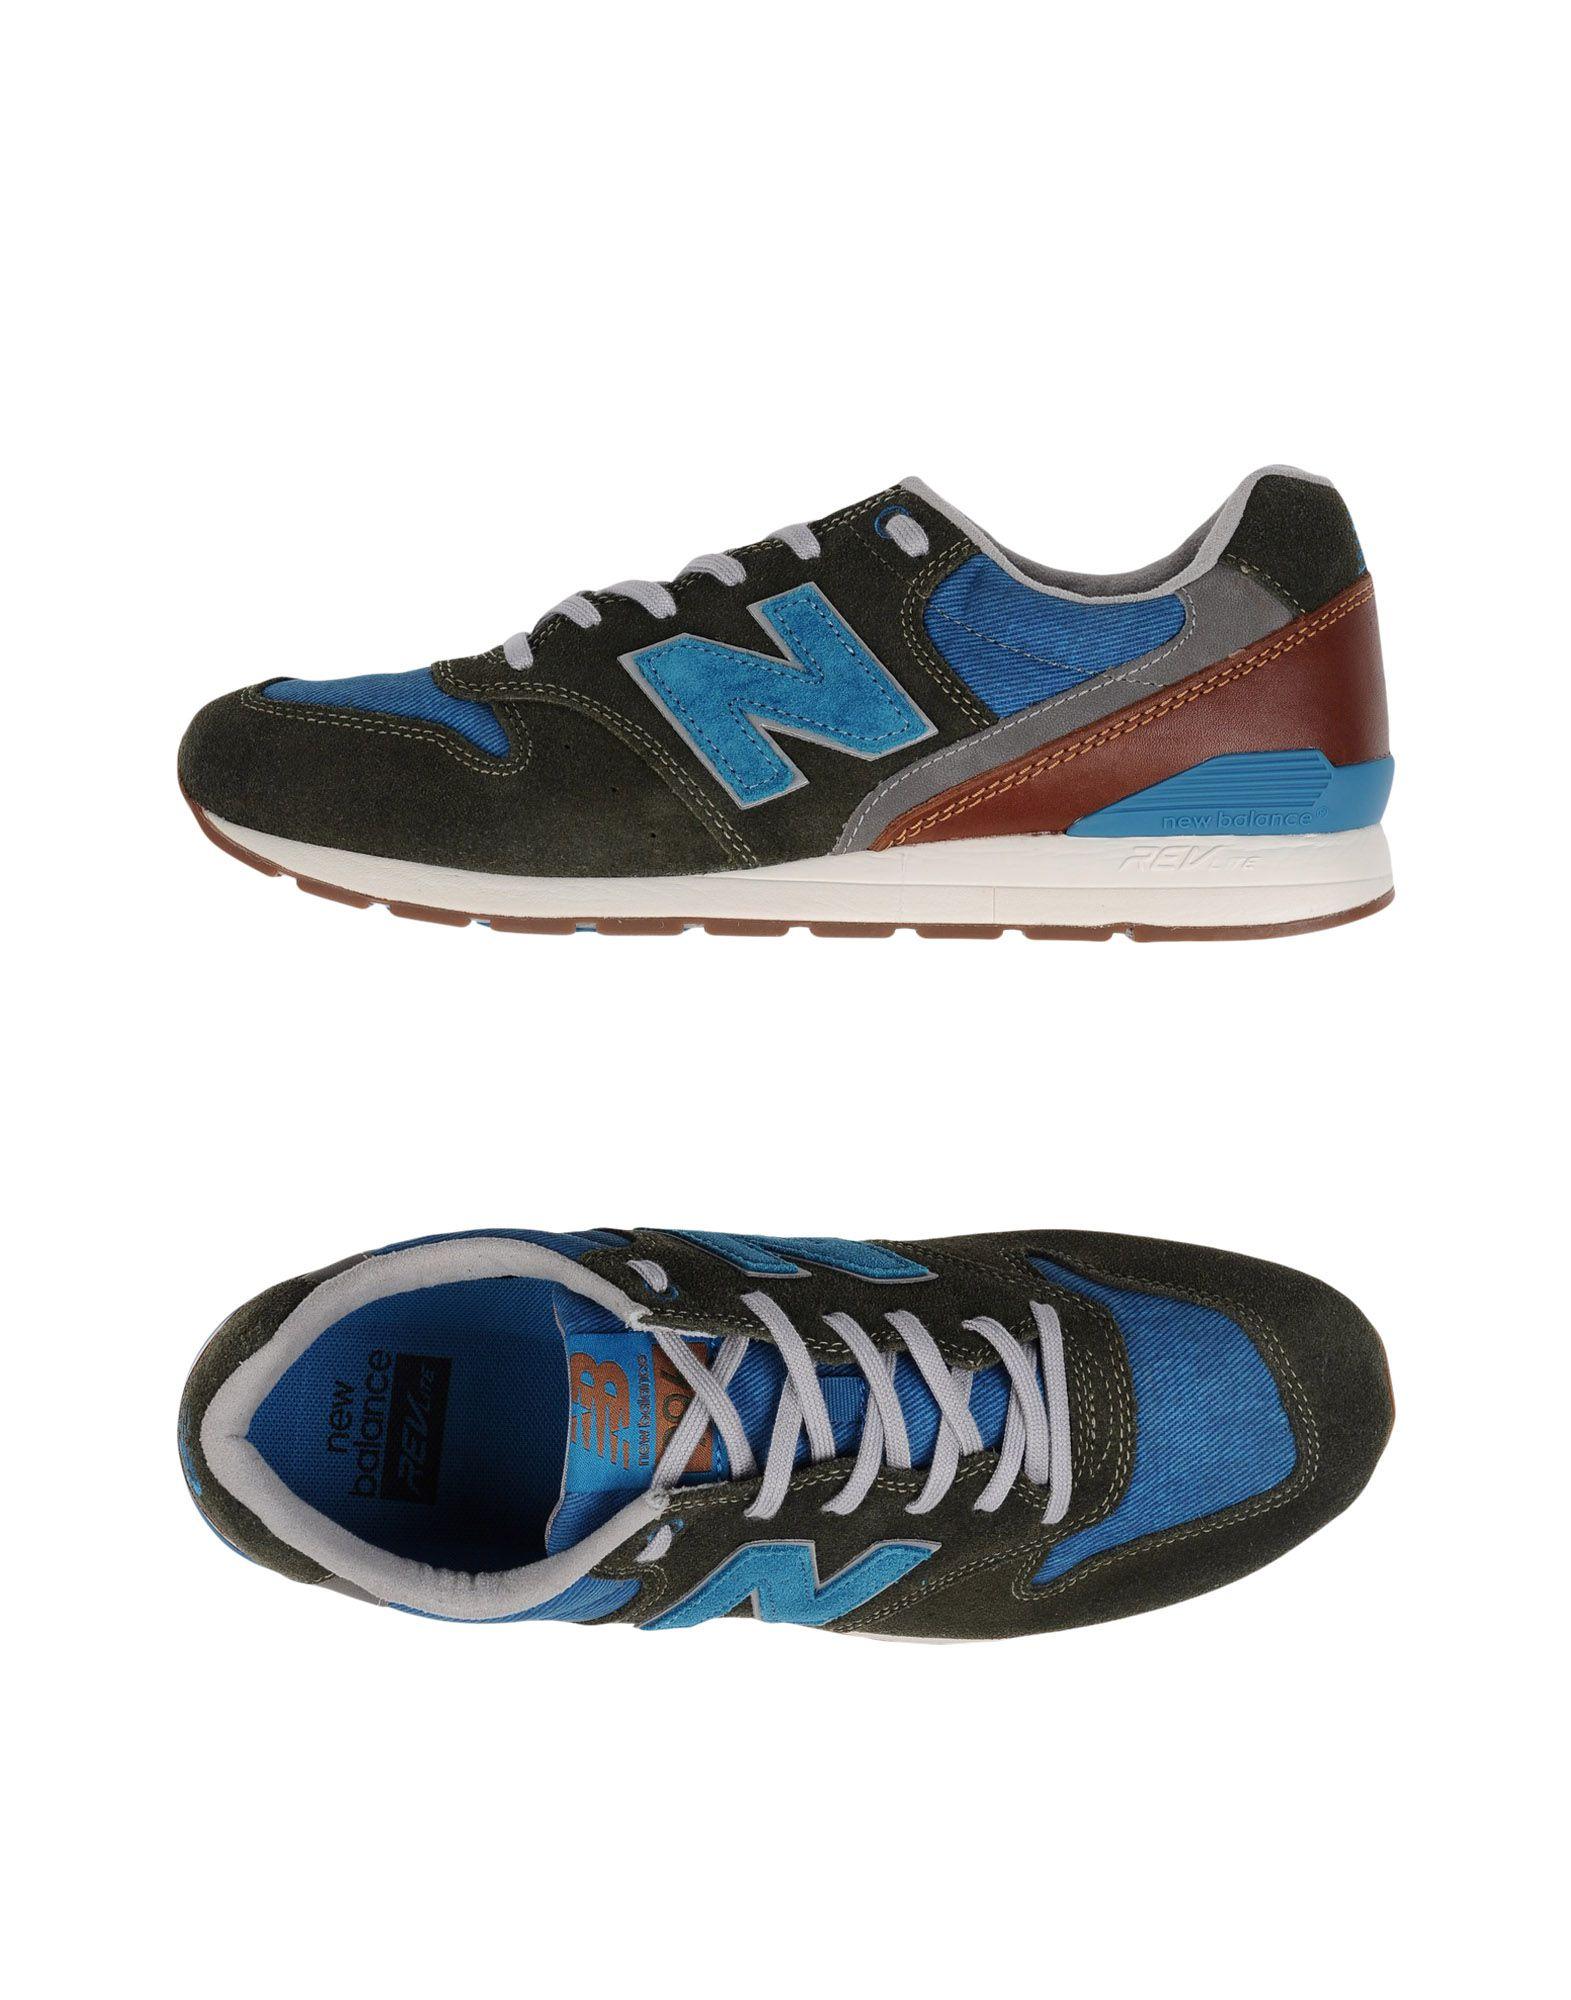 New Balance 996 Suede - Denim - Sneakers - Men Balance New Balance Men Sneakers online on  Canada - 11158348LU a72fc6